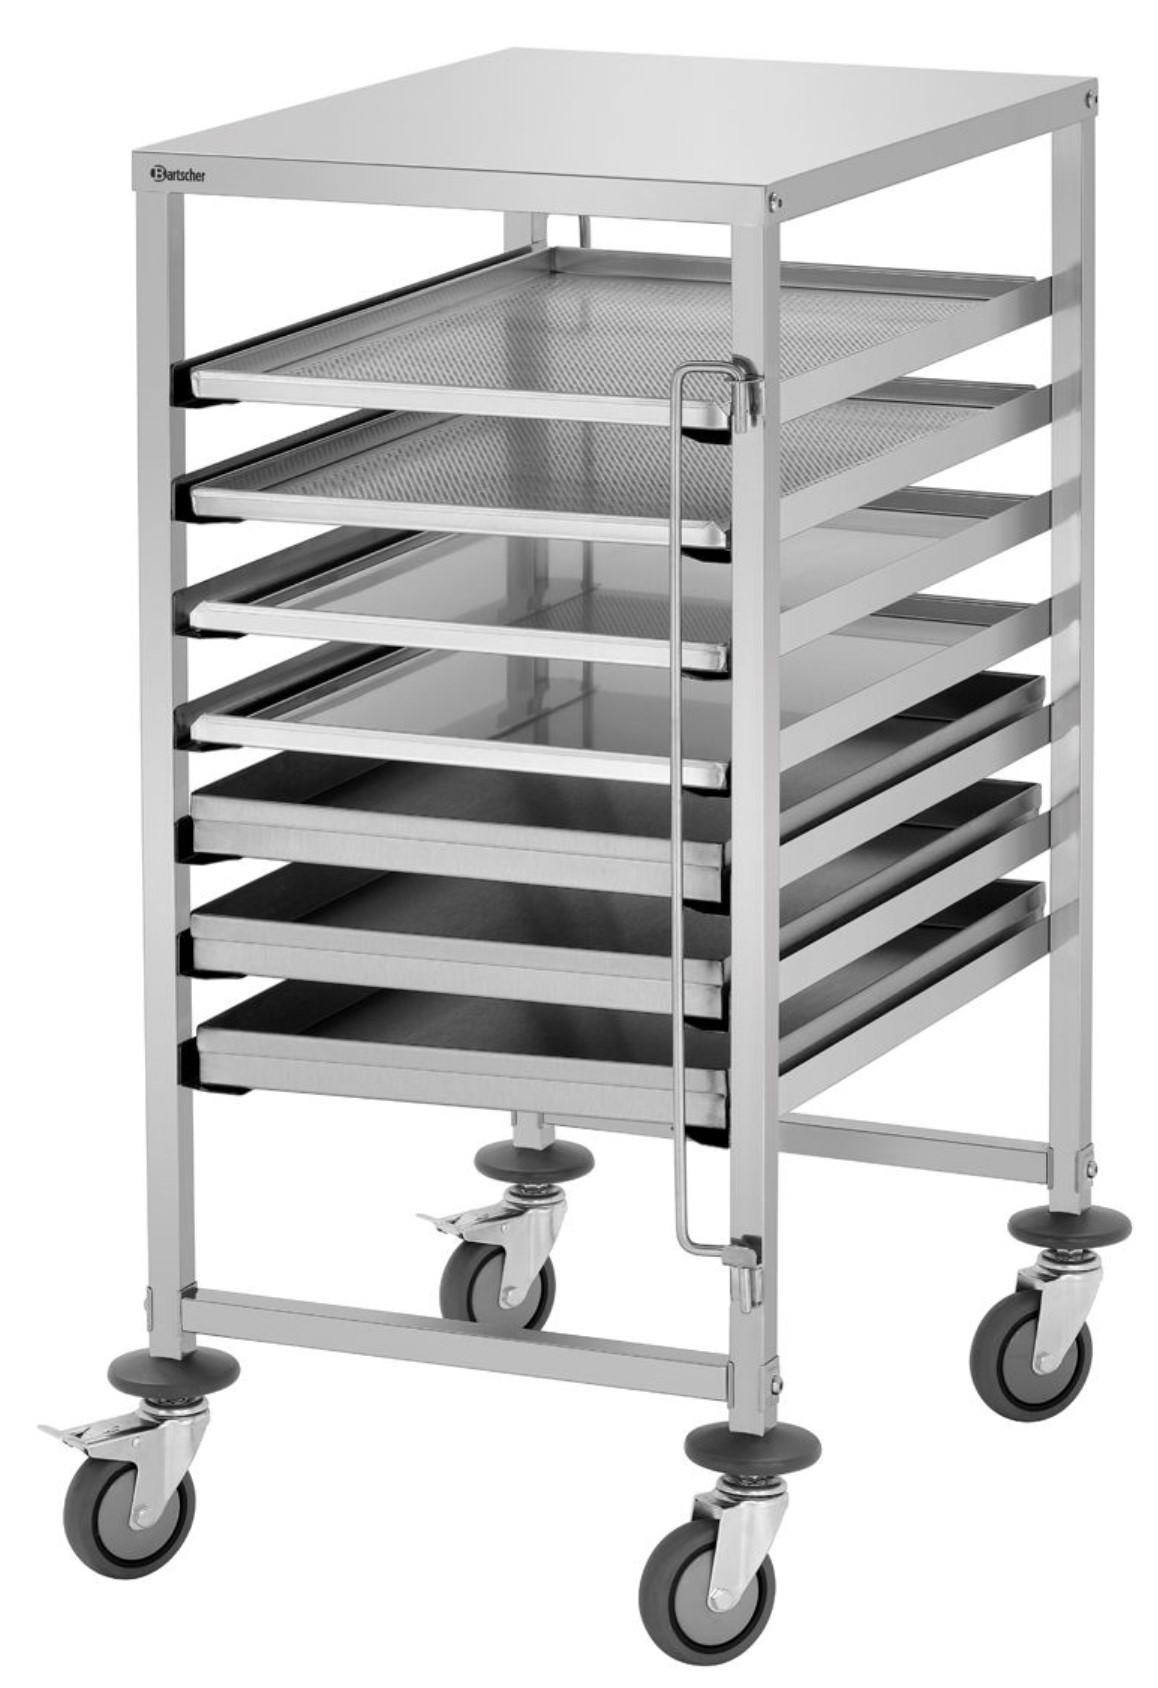 trolley-7-8esewn-60x40-300089-genikoemporio-zagorianos